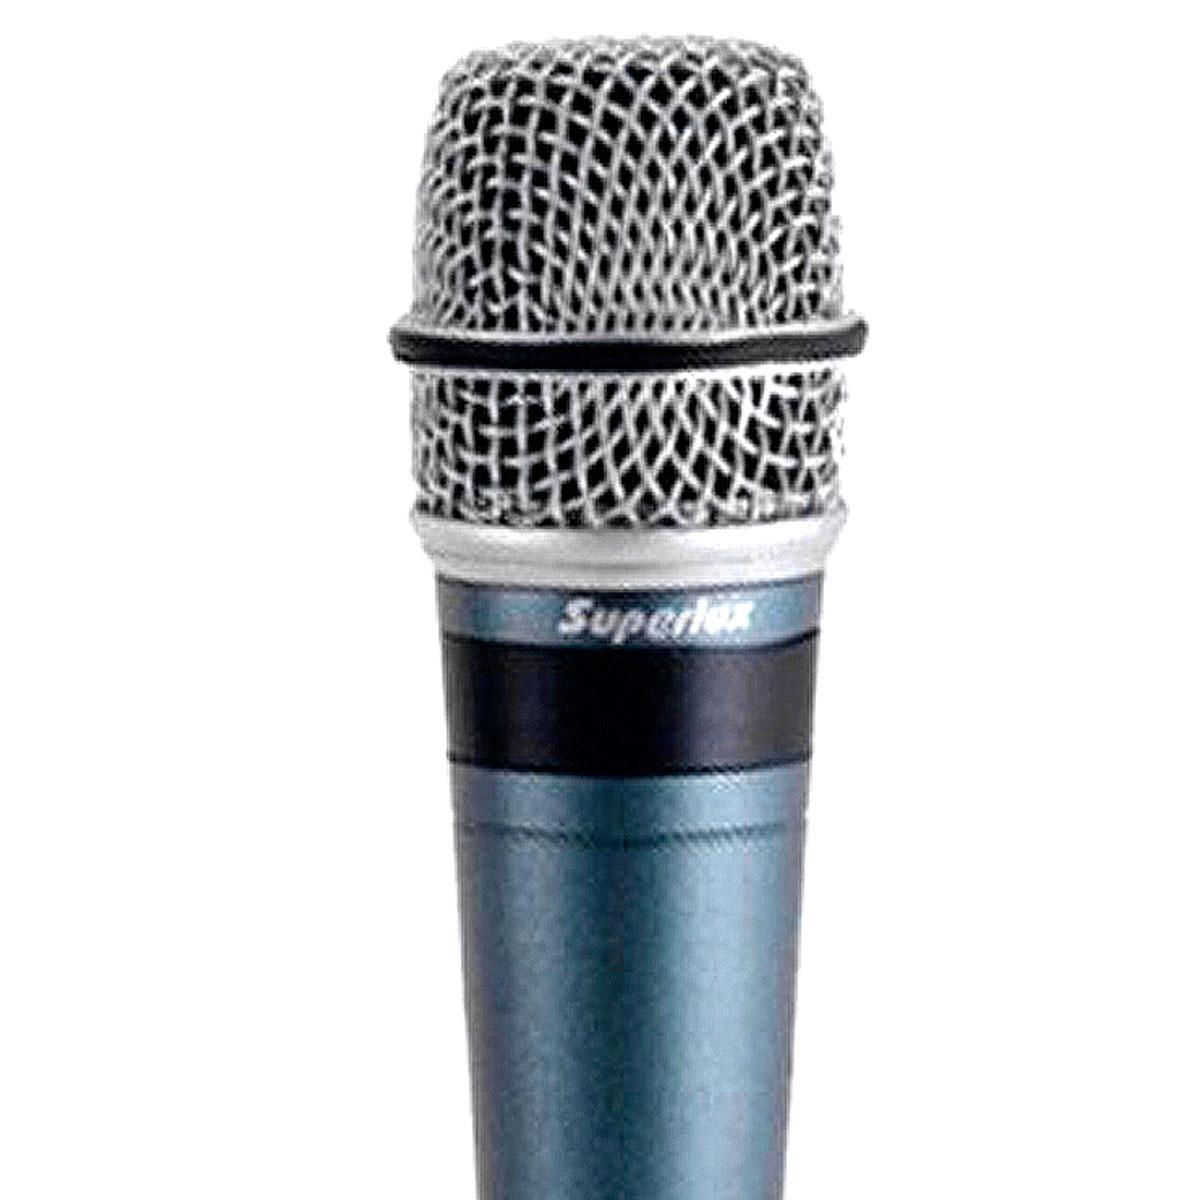 PRO258 - Microfone c/ Fio de M�o p/ Est�dio PRO 258 - Superlux